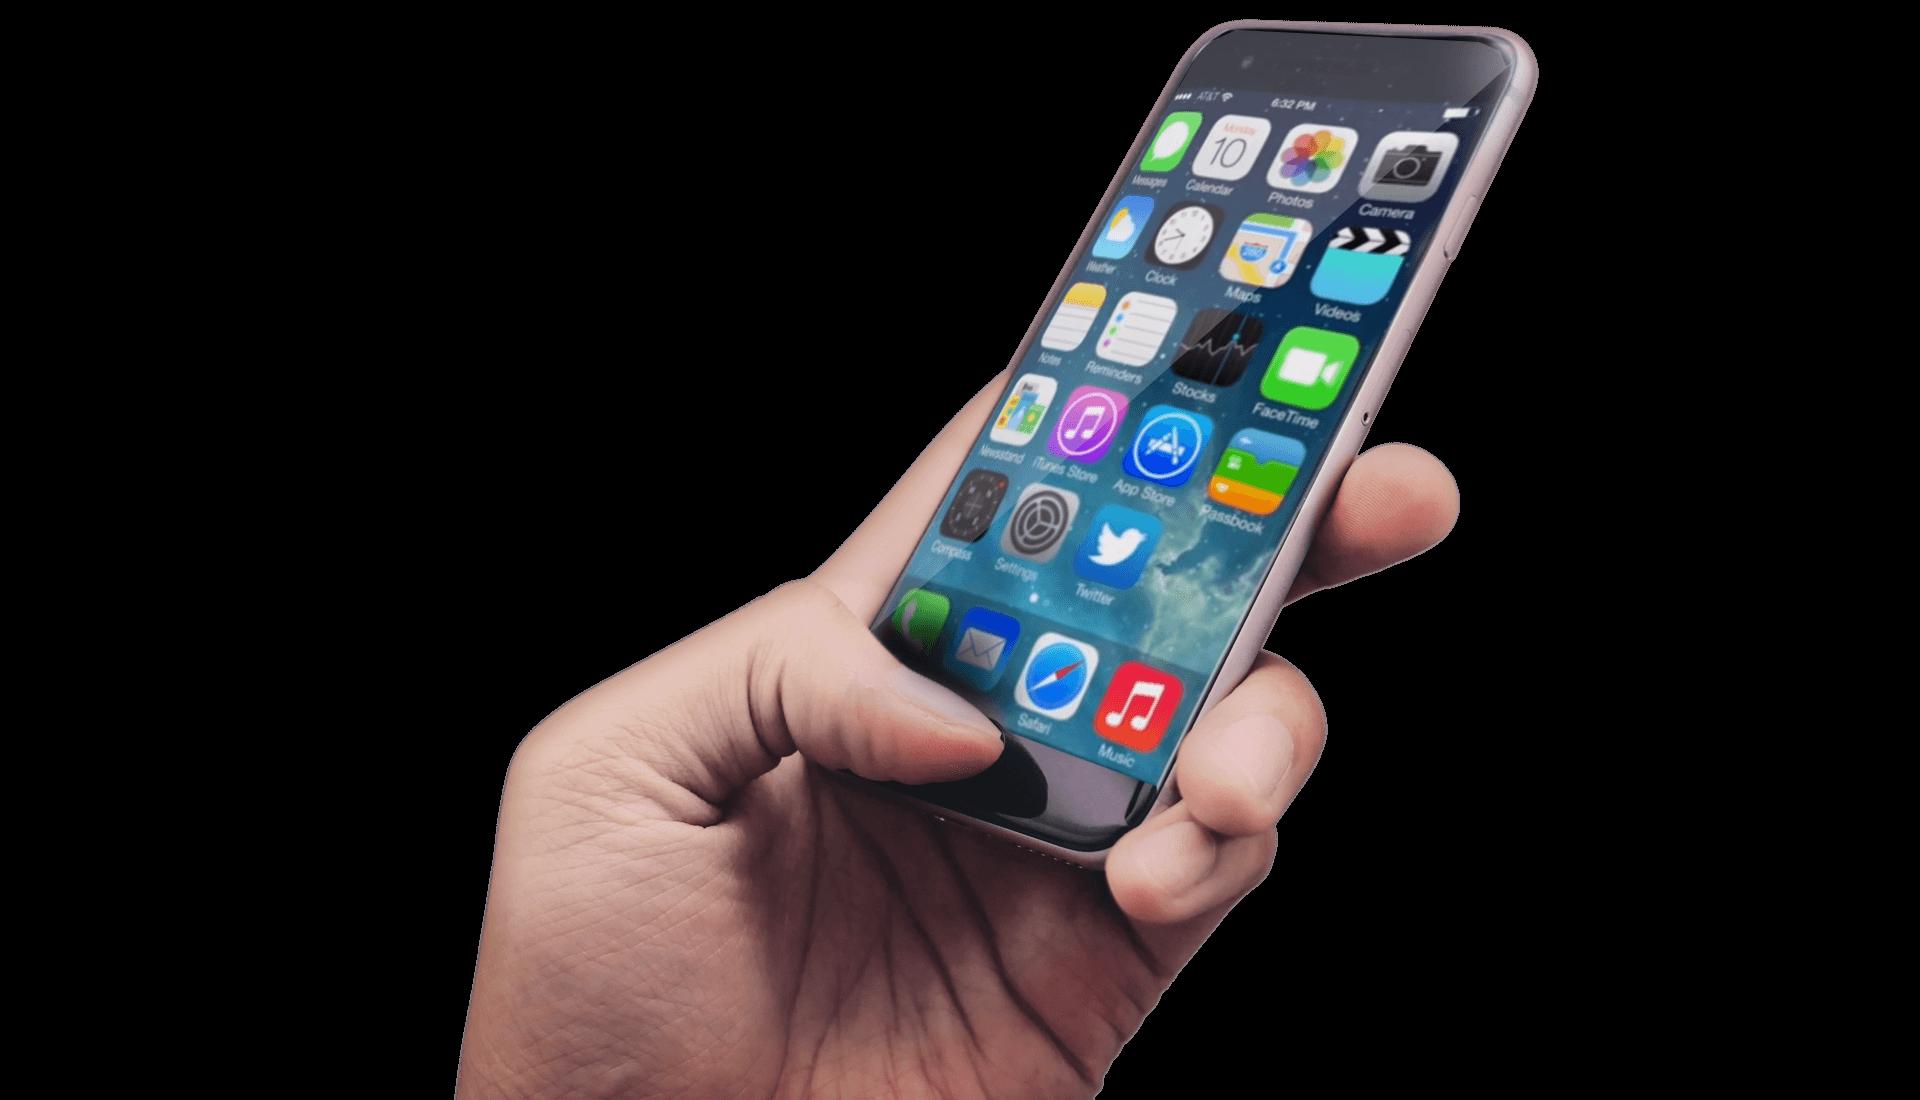 iphone 6 tenuto in mano